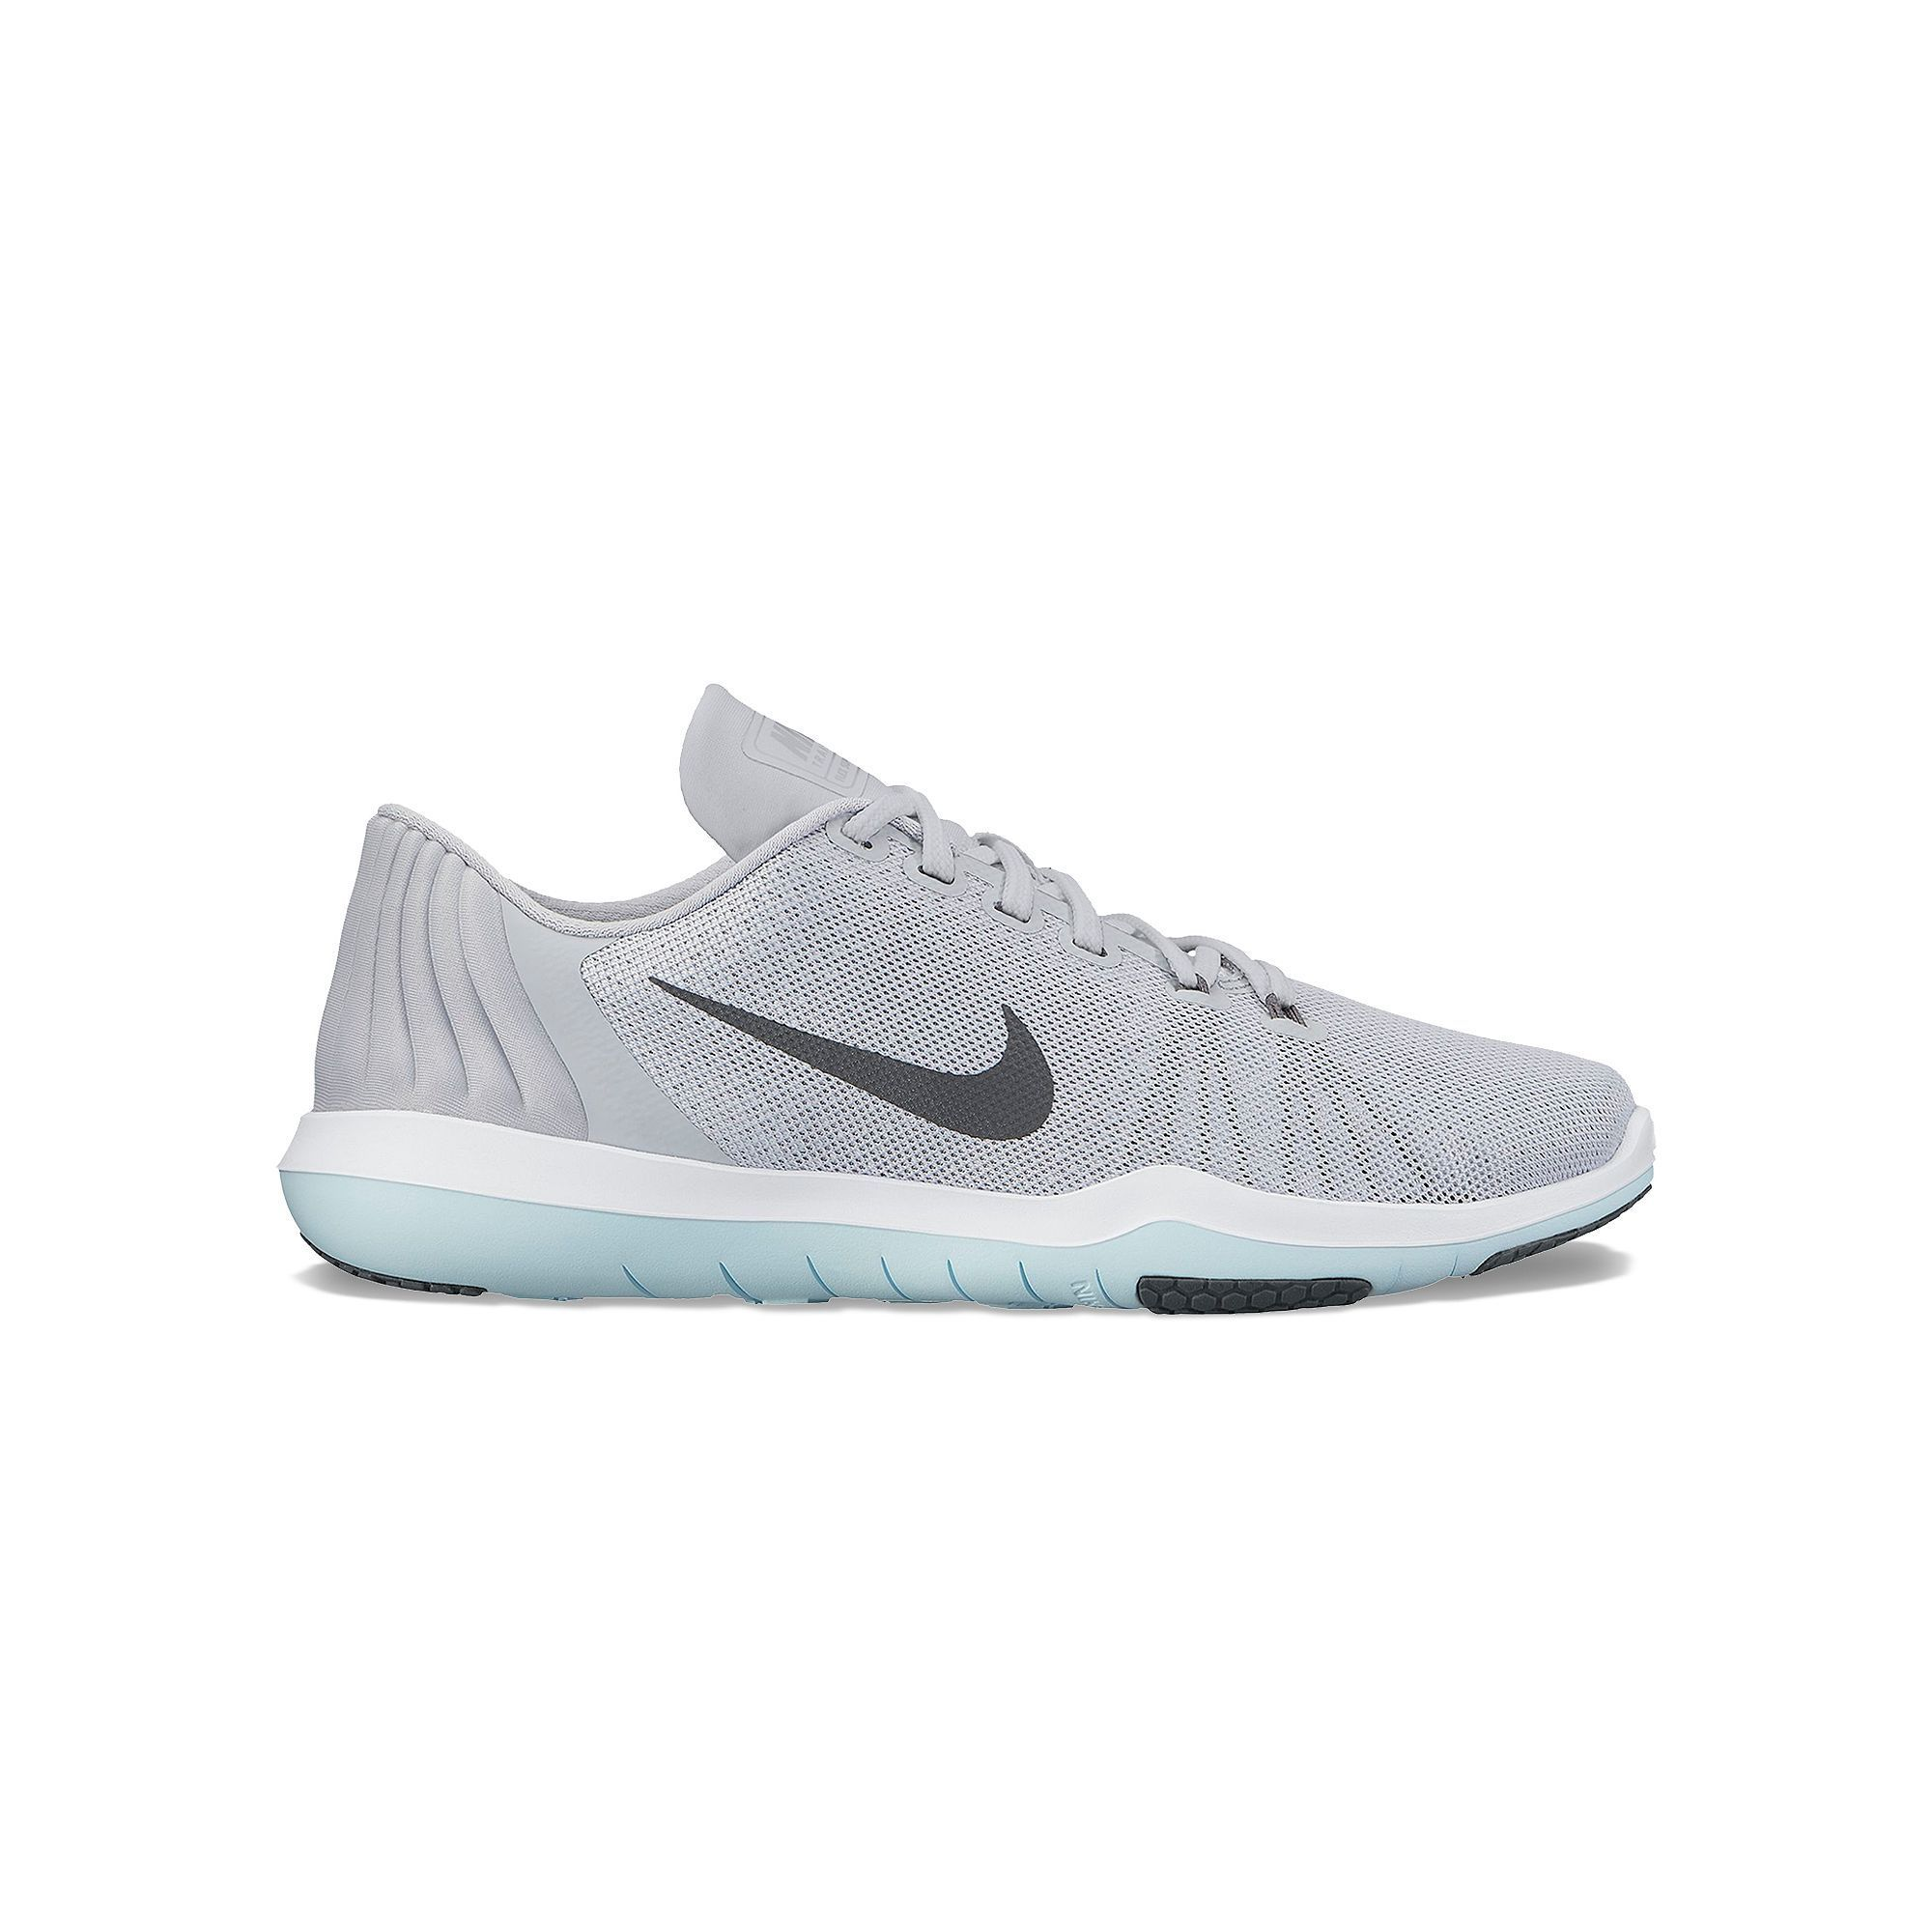 68403fa31381 Nike Flex Supreme TR 5 Women s Cross-Training Shoes